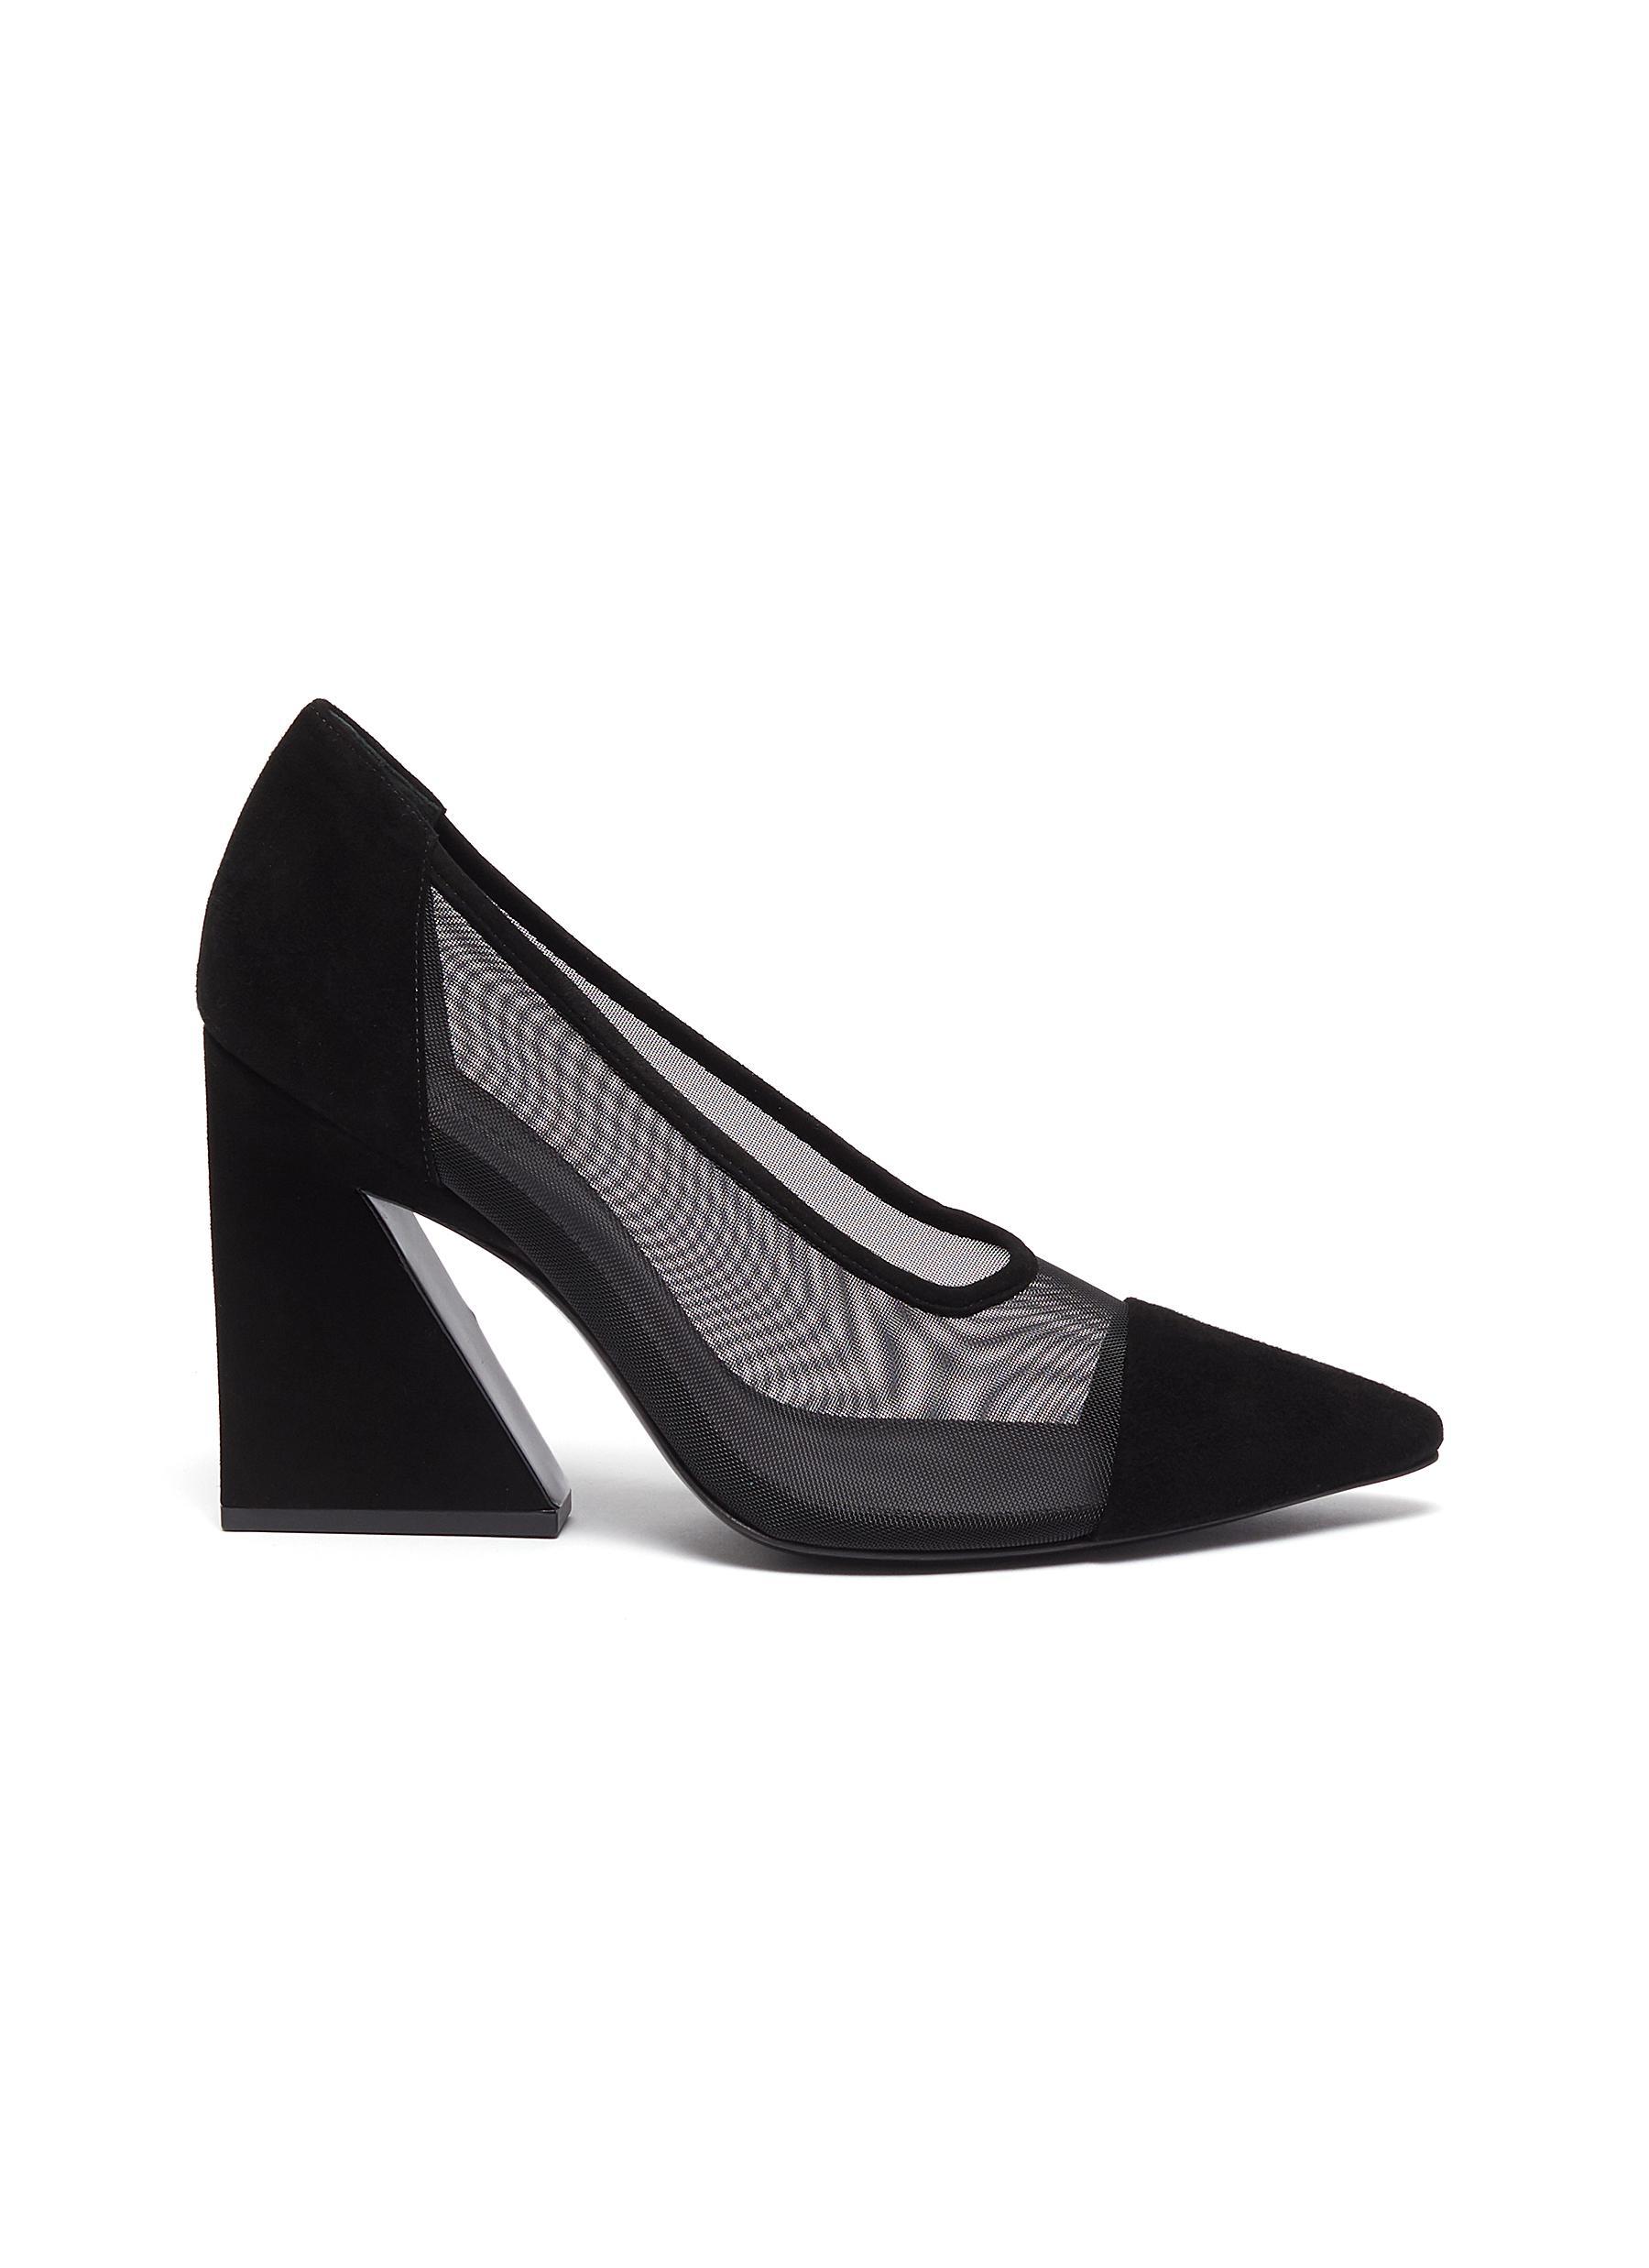 Mercedes Castillo High Heels Anthea angle block heel pumps